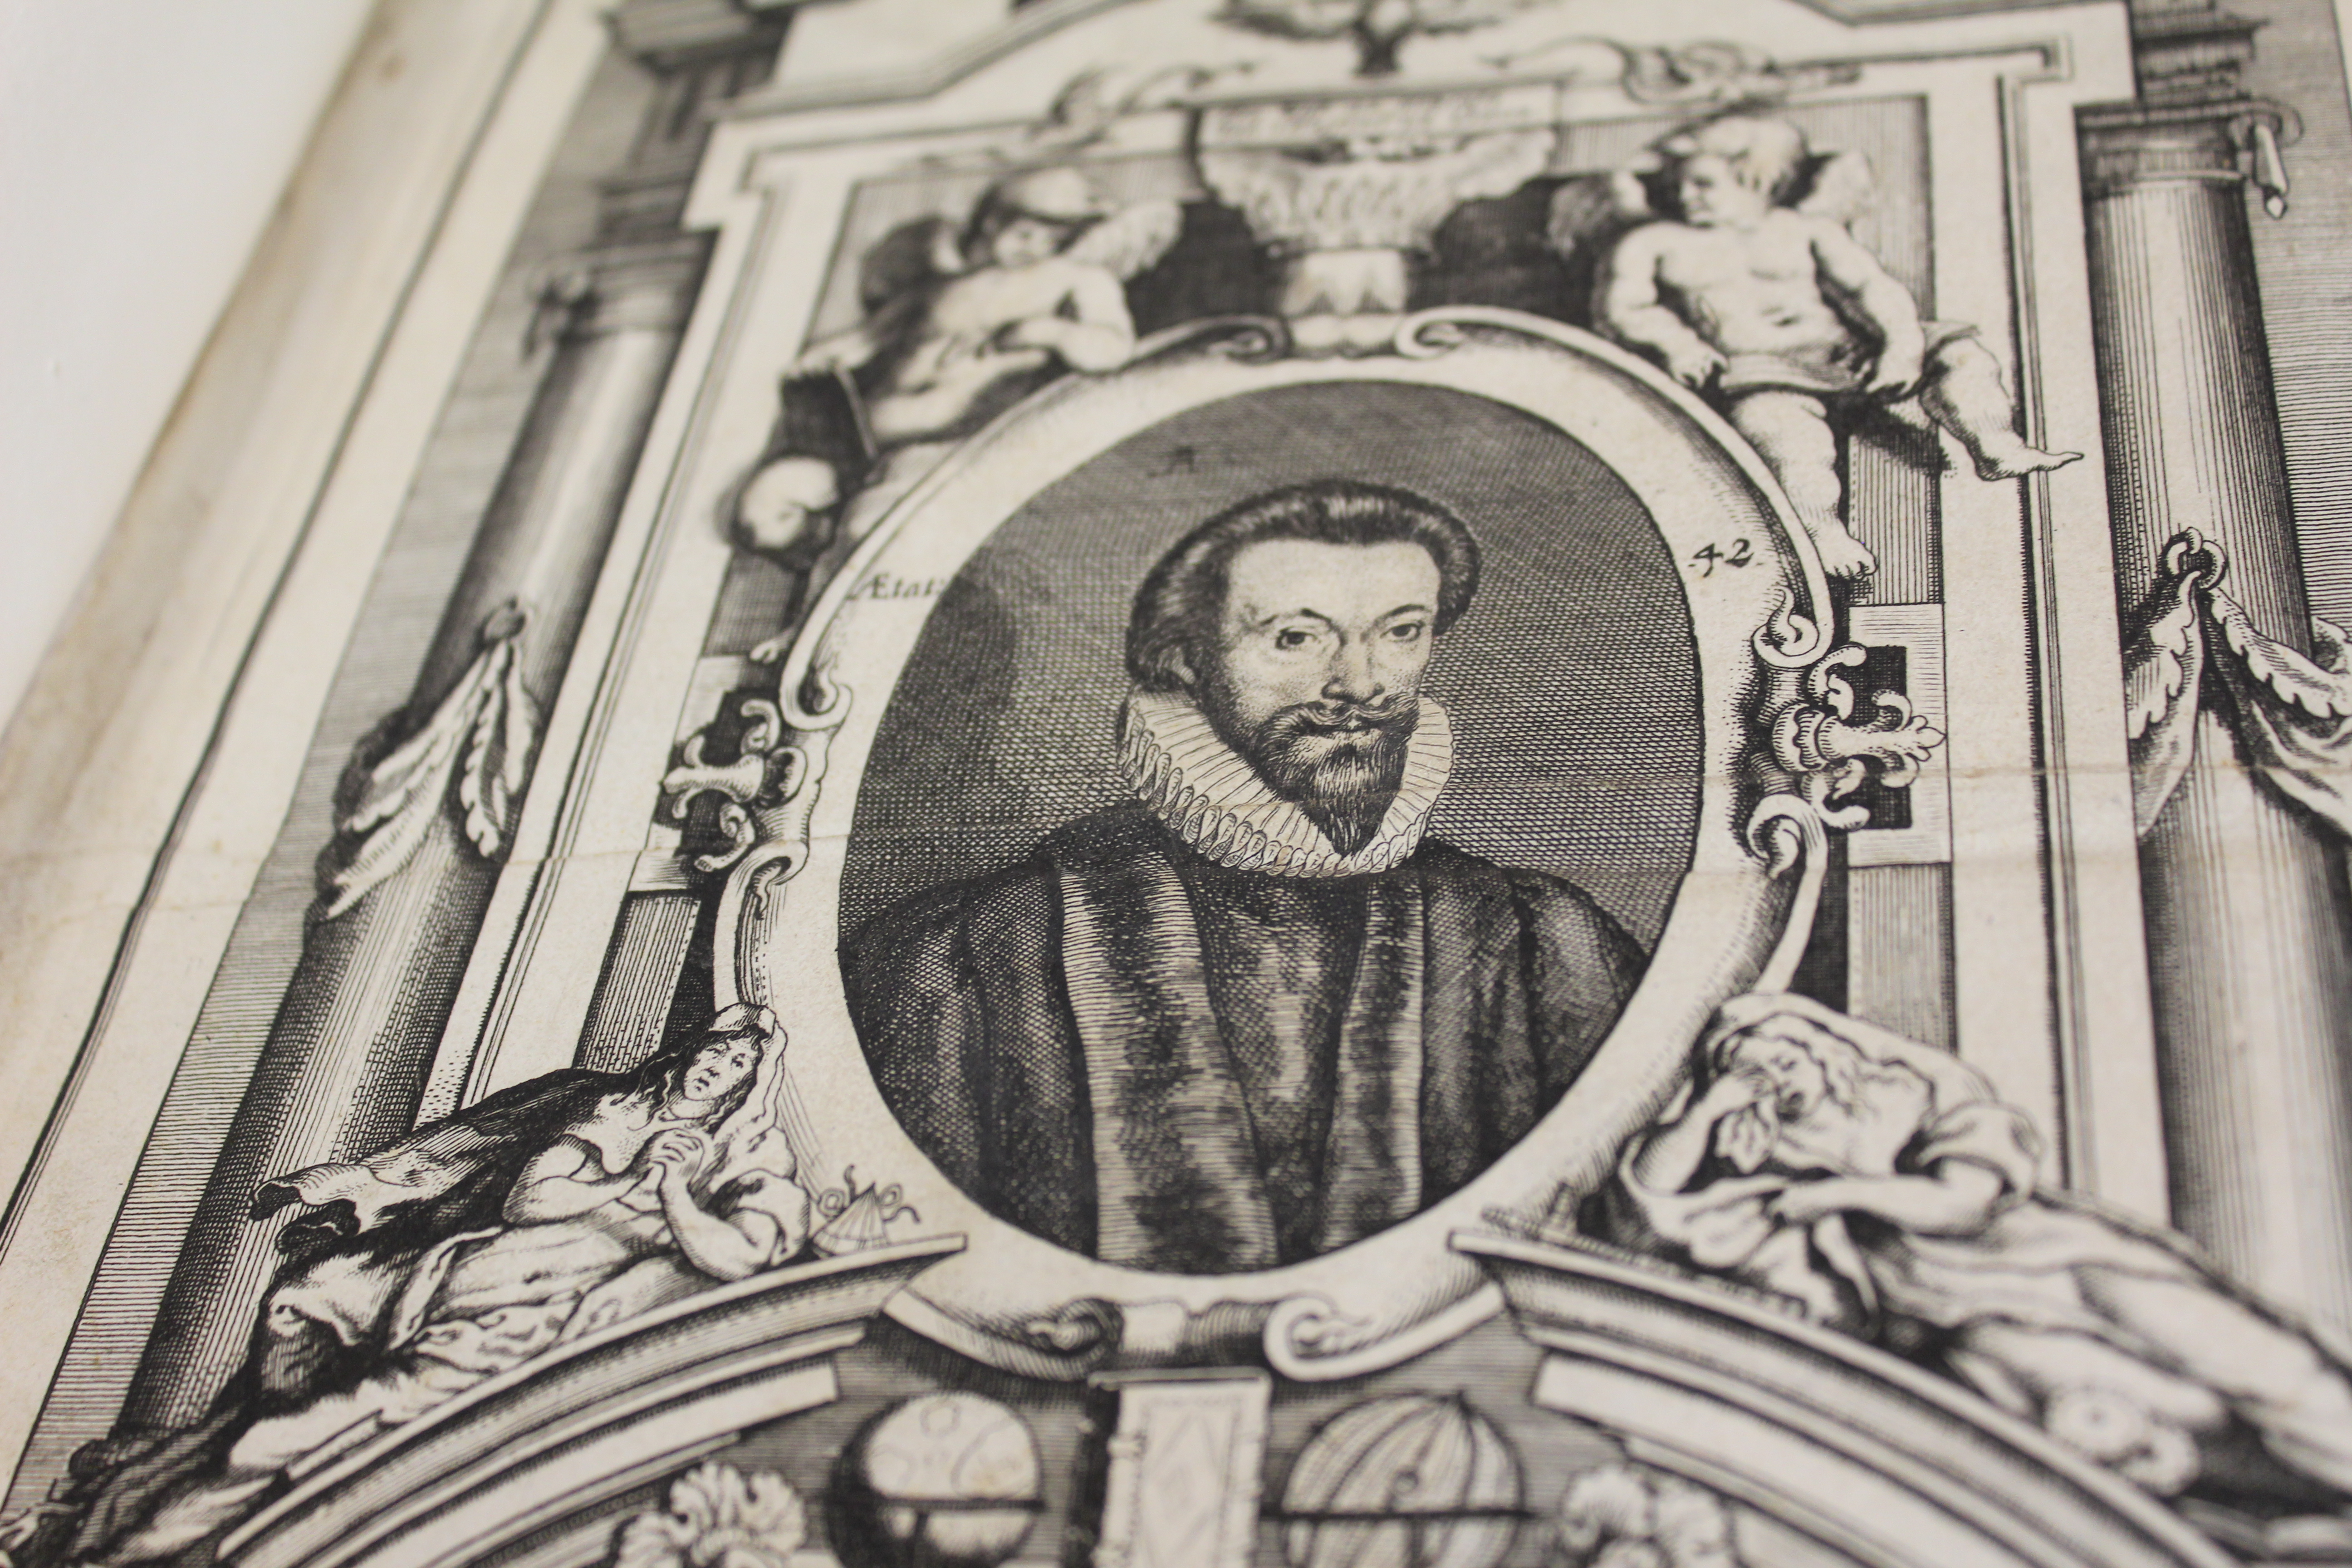 Engraving of John Donne